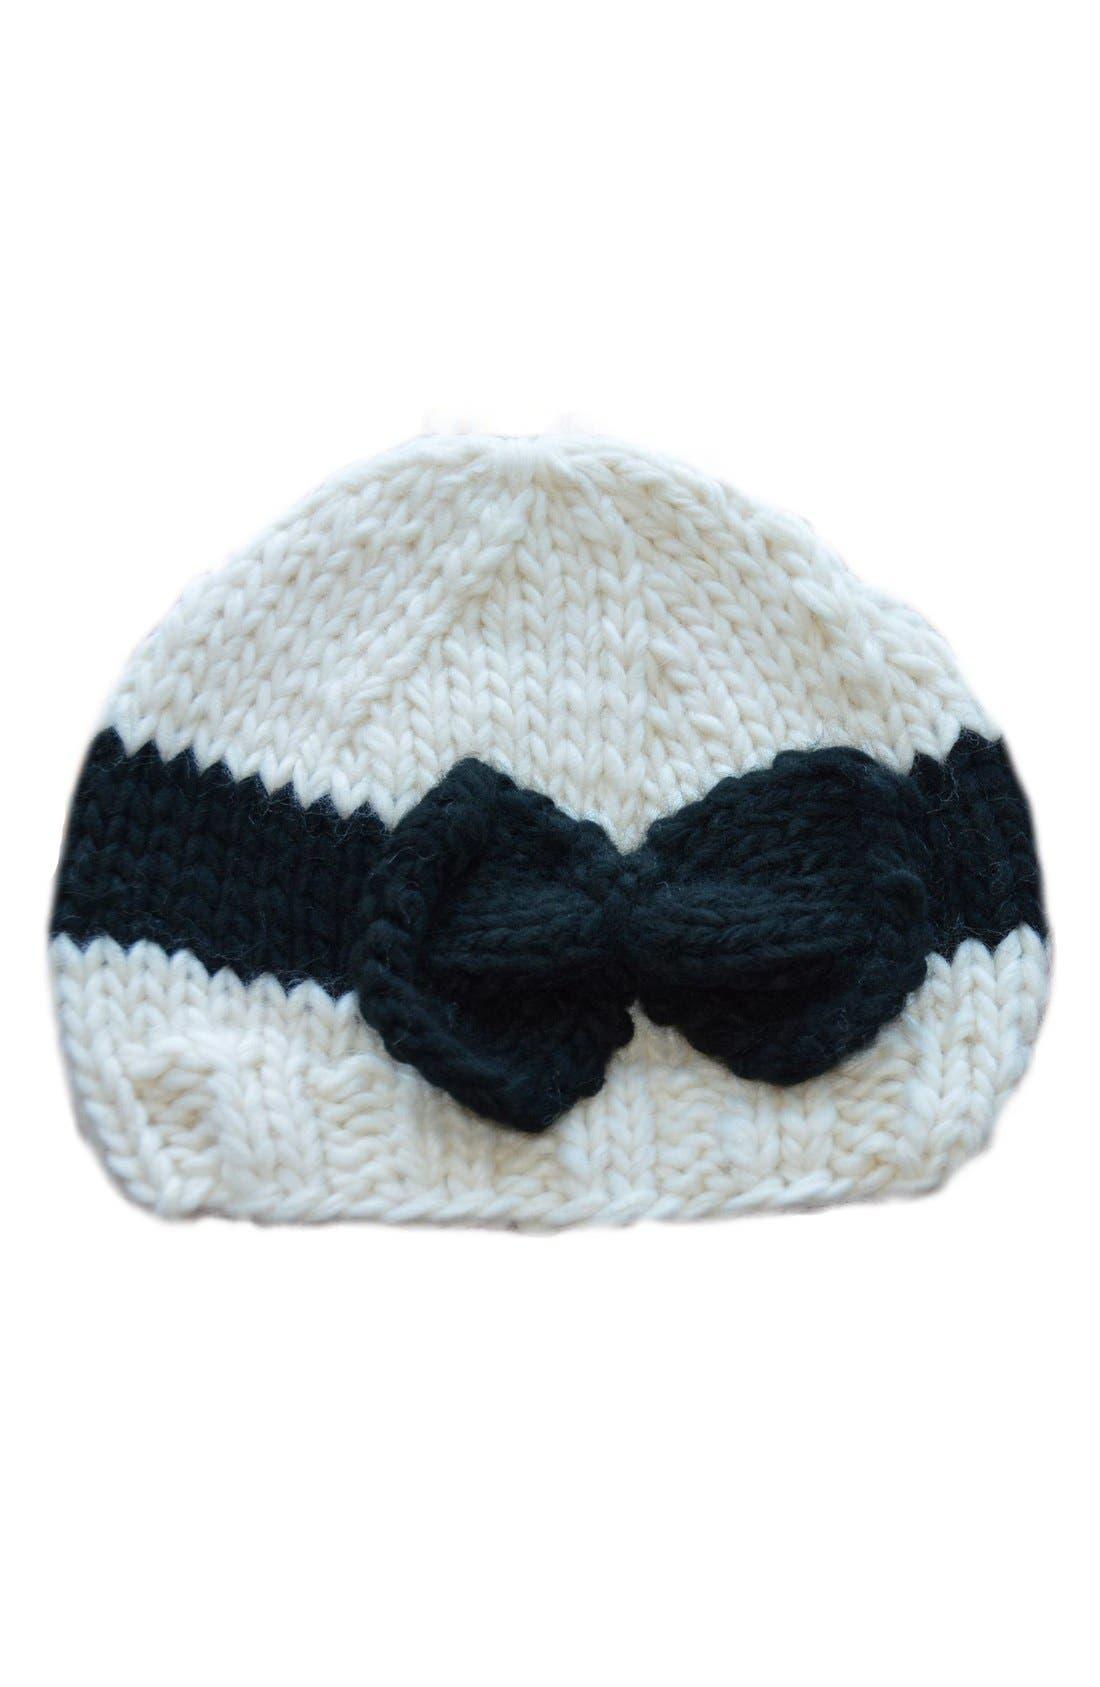 Blueberry Hill 'Sabrina' Knit Cap (Baby Girls)